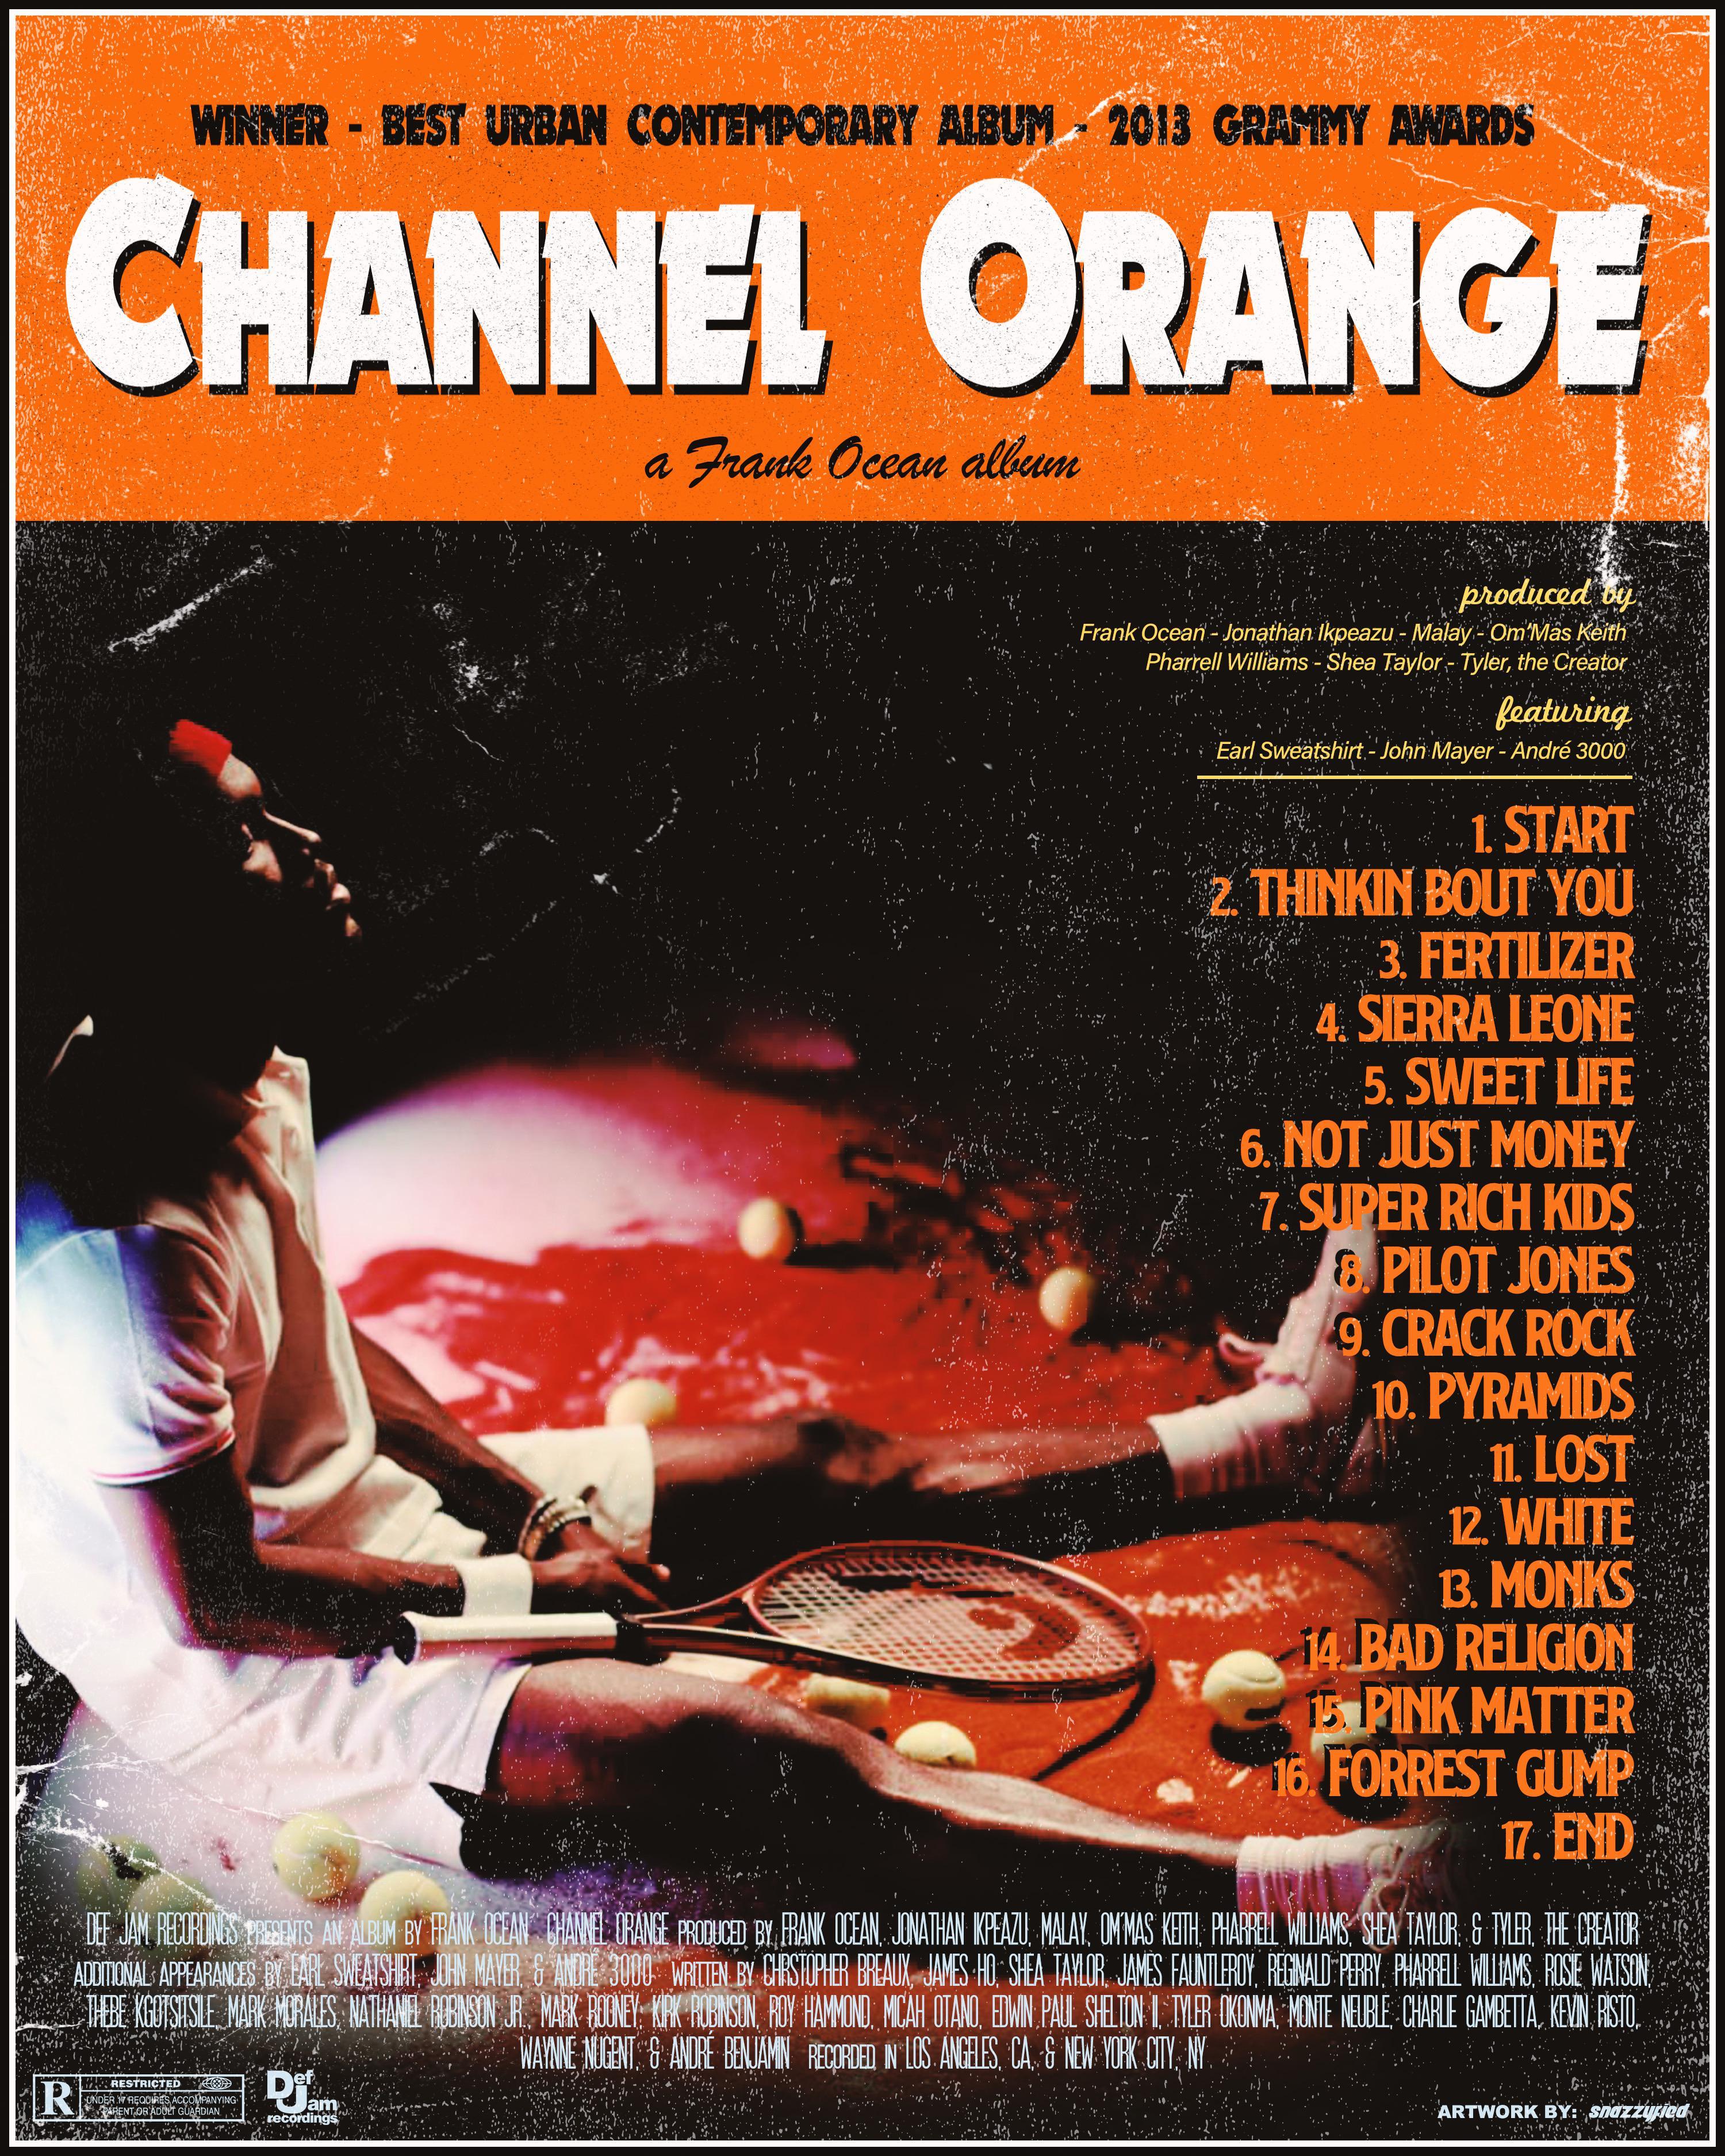 channel orange x pulp fiction movie